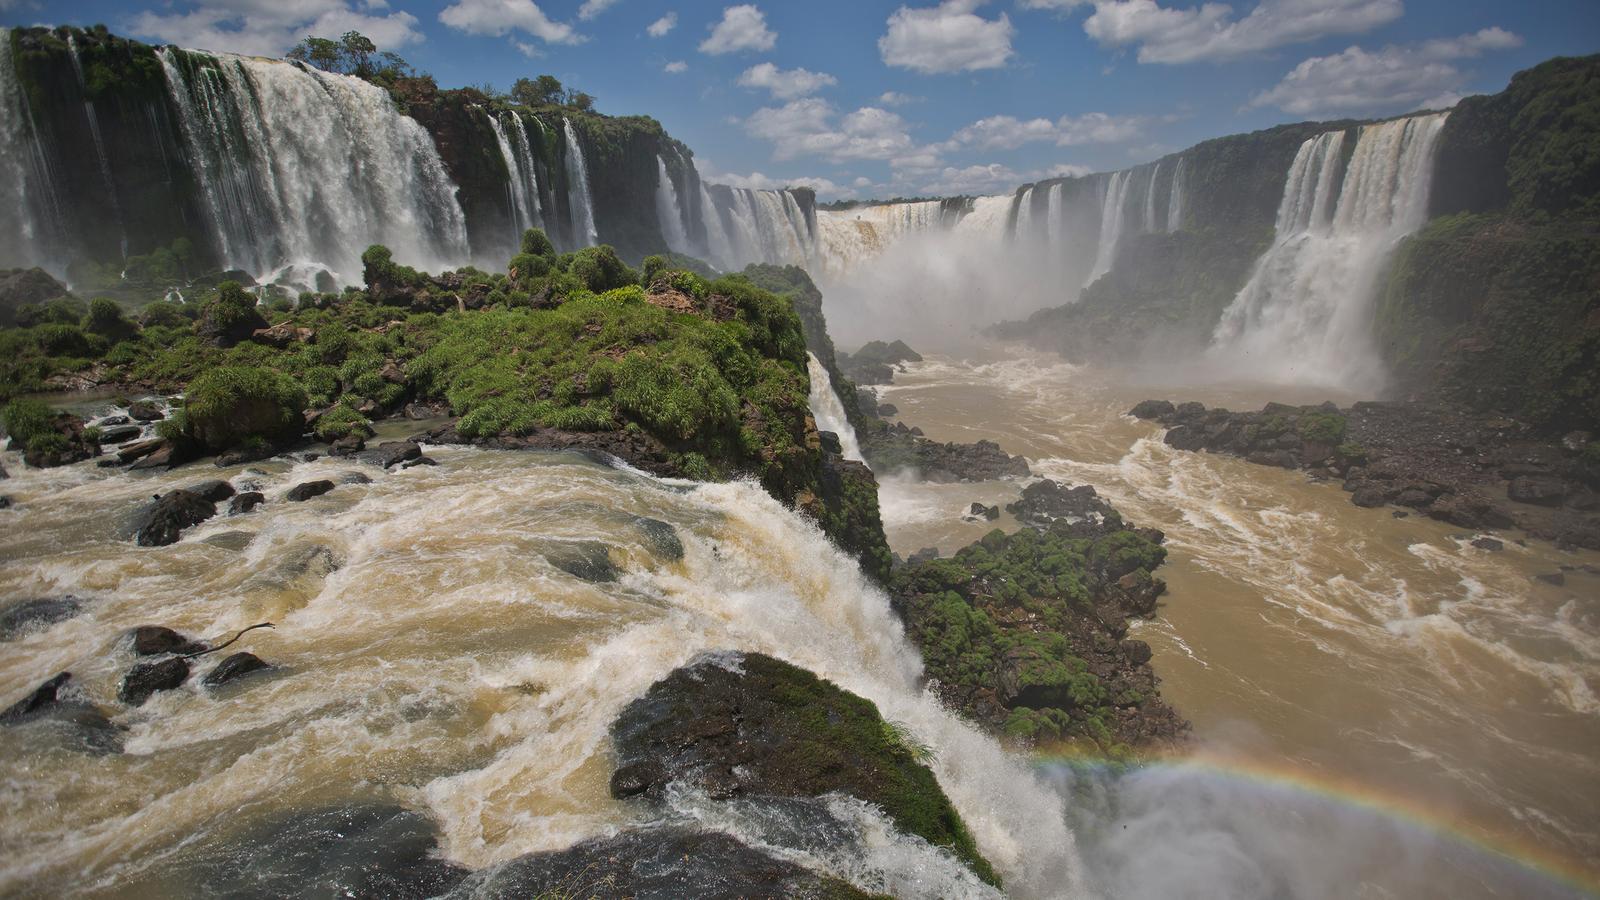 Rio de Janeiro to Buenos Aires: Waterfalls & White Sands